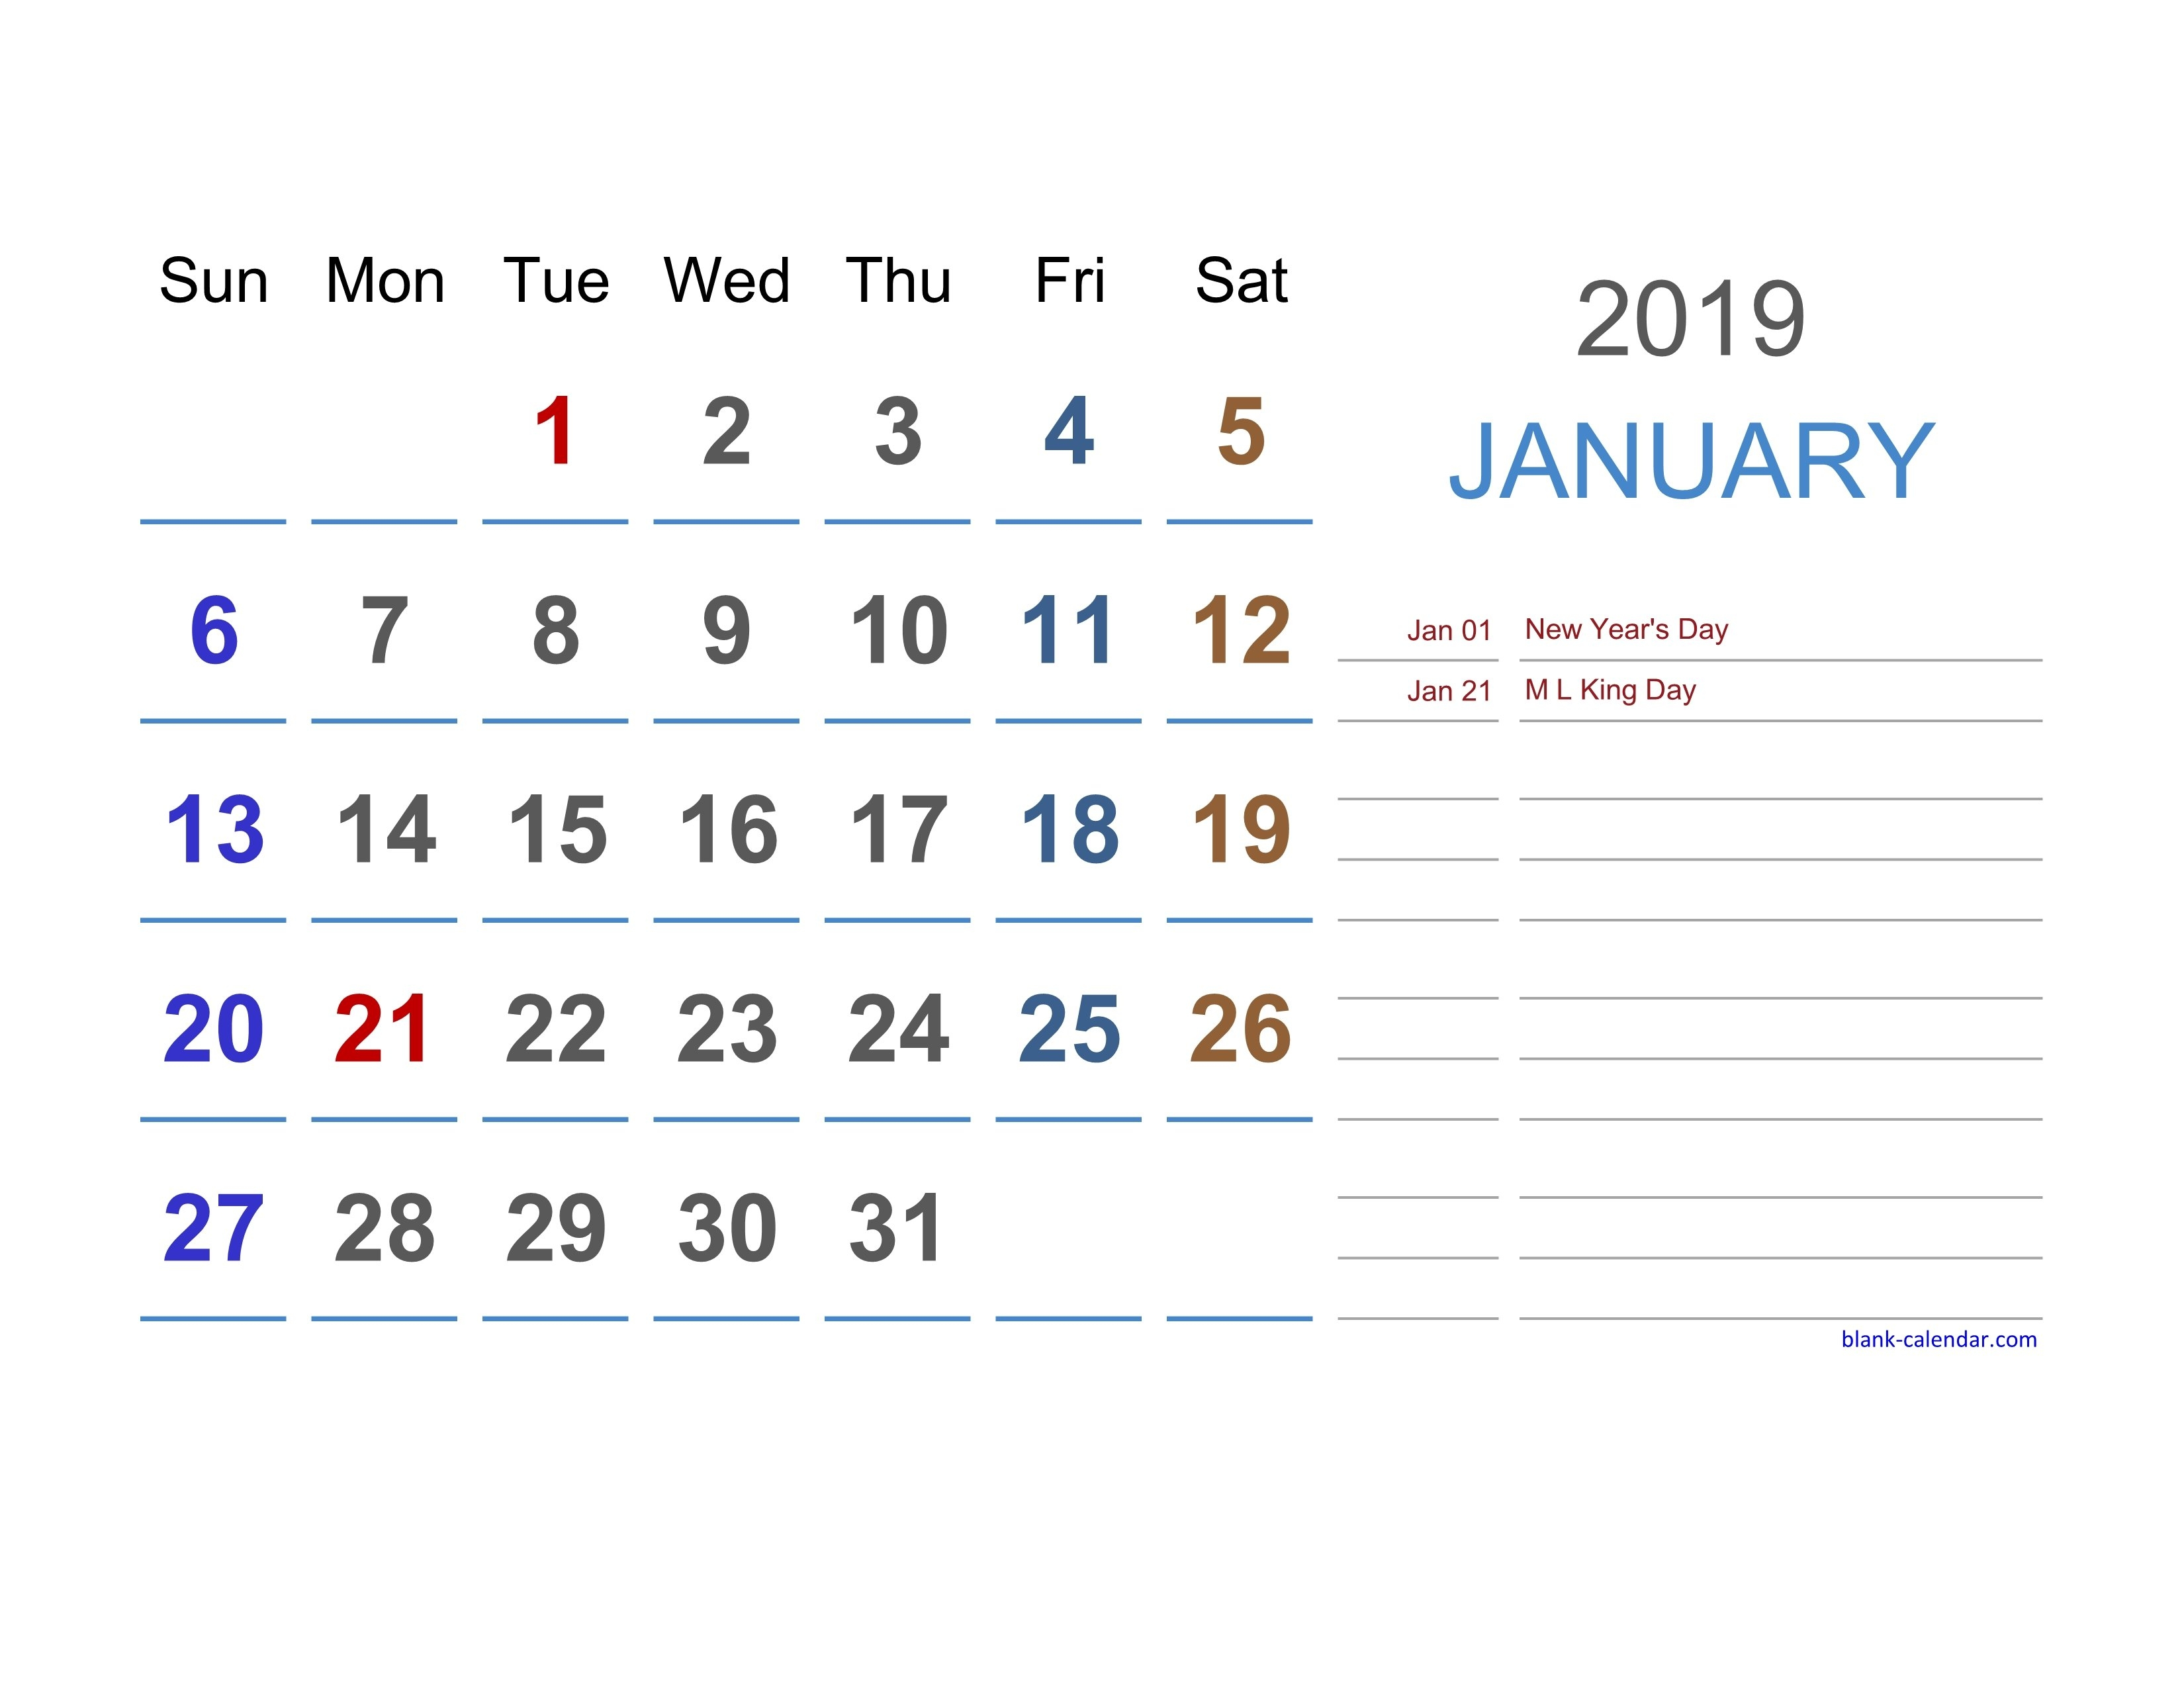 Free Download 2019 Excel Calendar Large Space For Notes (Horizontal) Calendar 2019 Excel